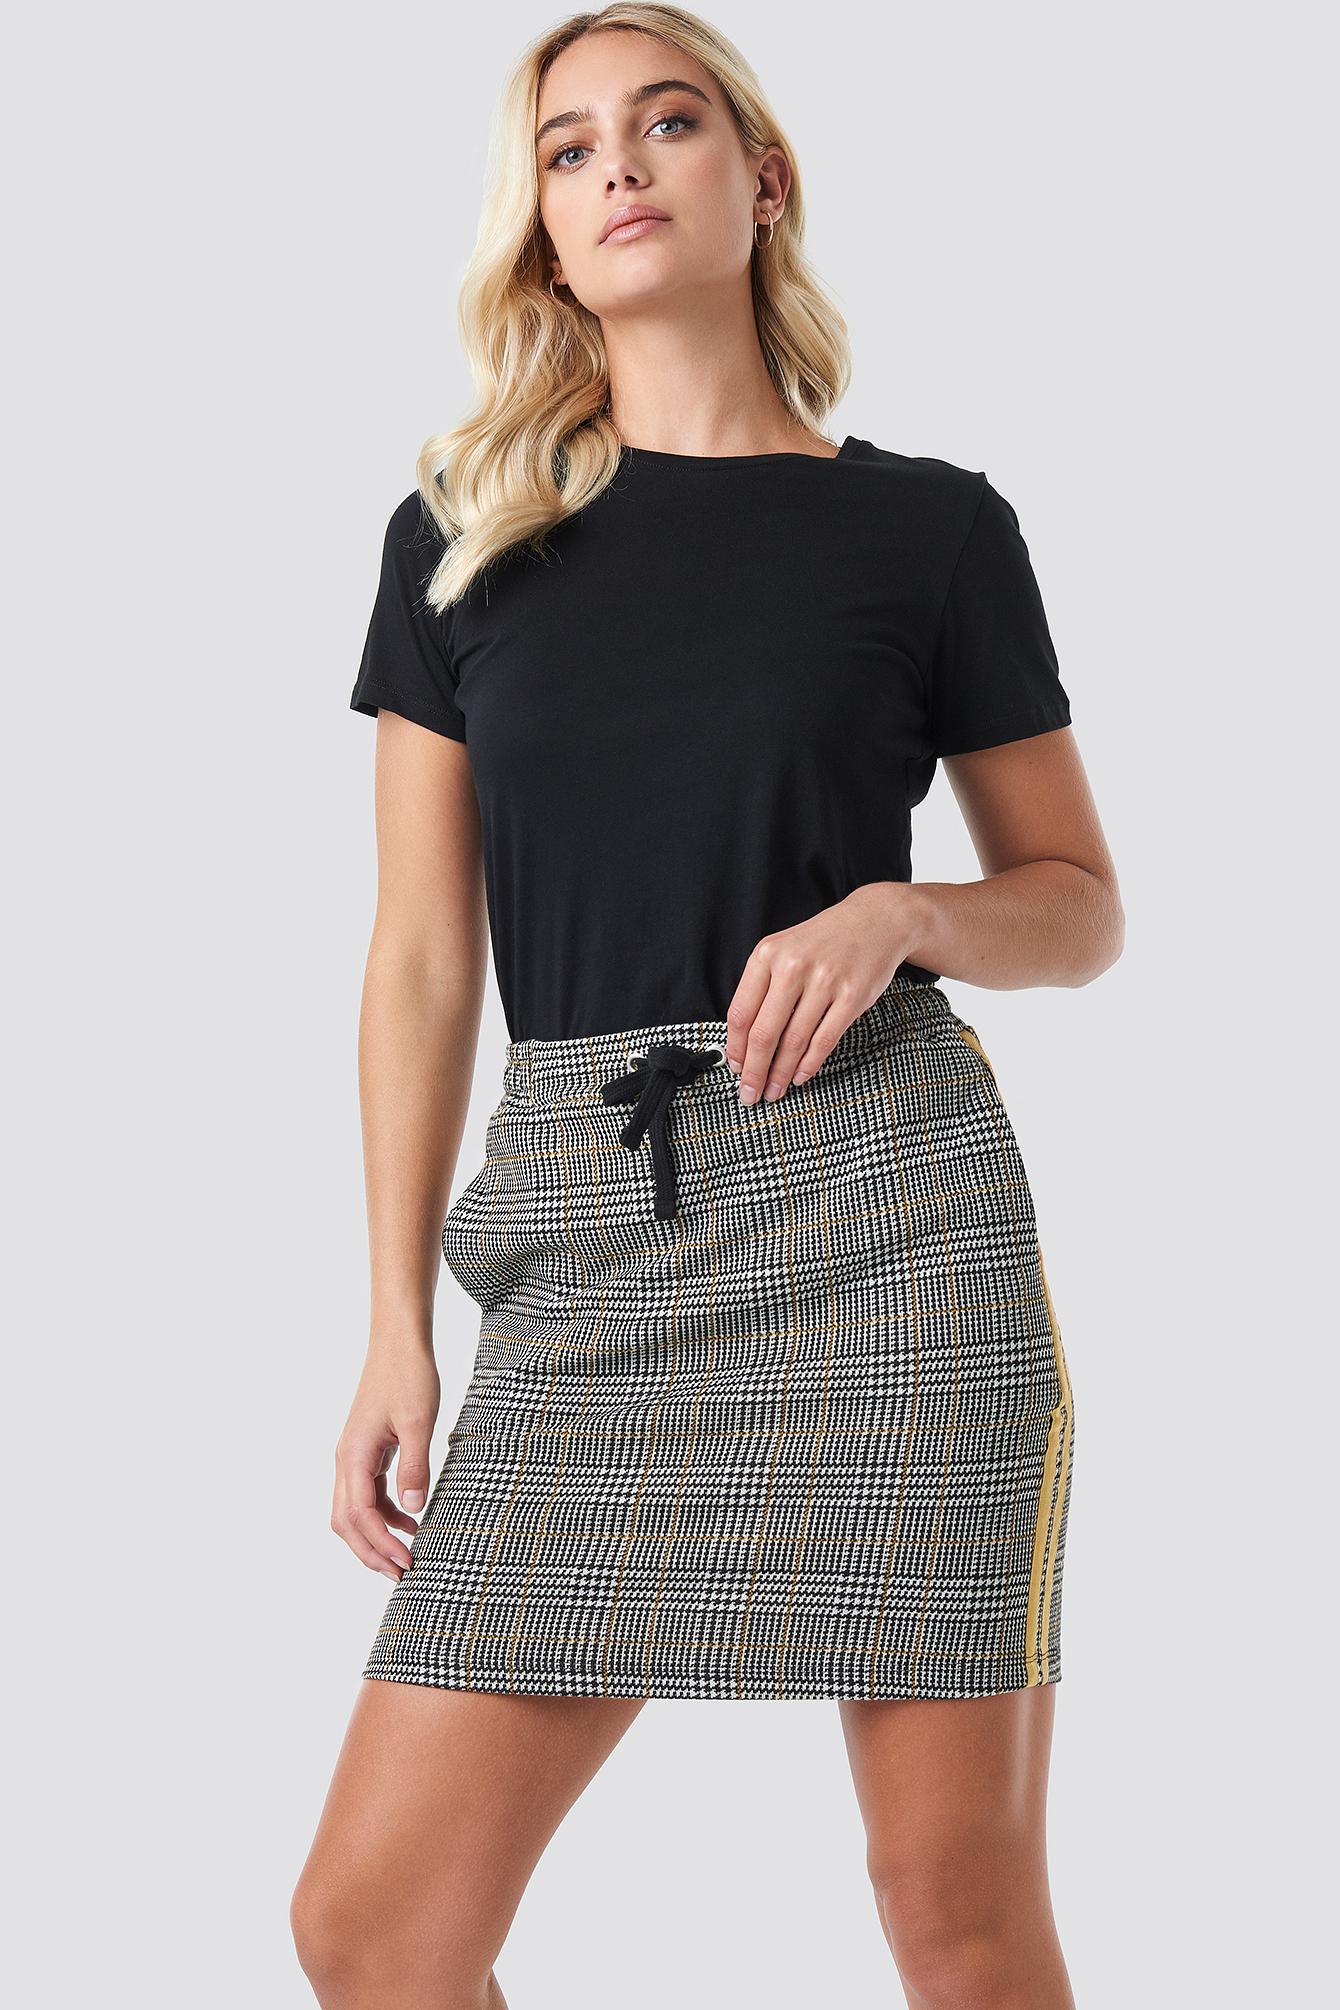 Jacquard Check Skirt NA-KD.COM